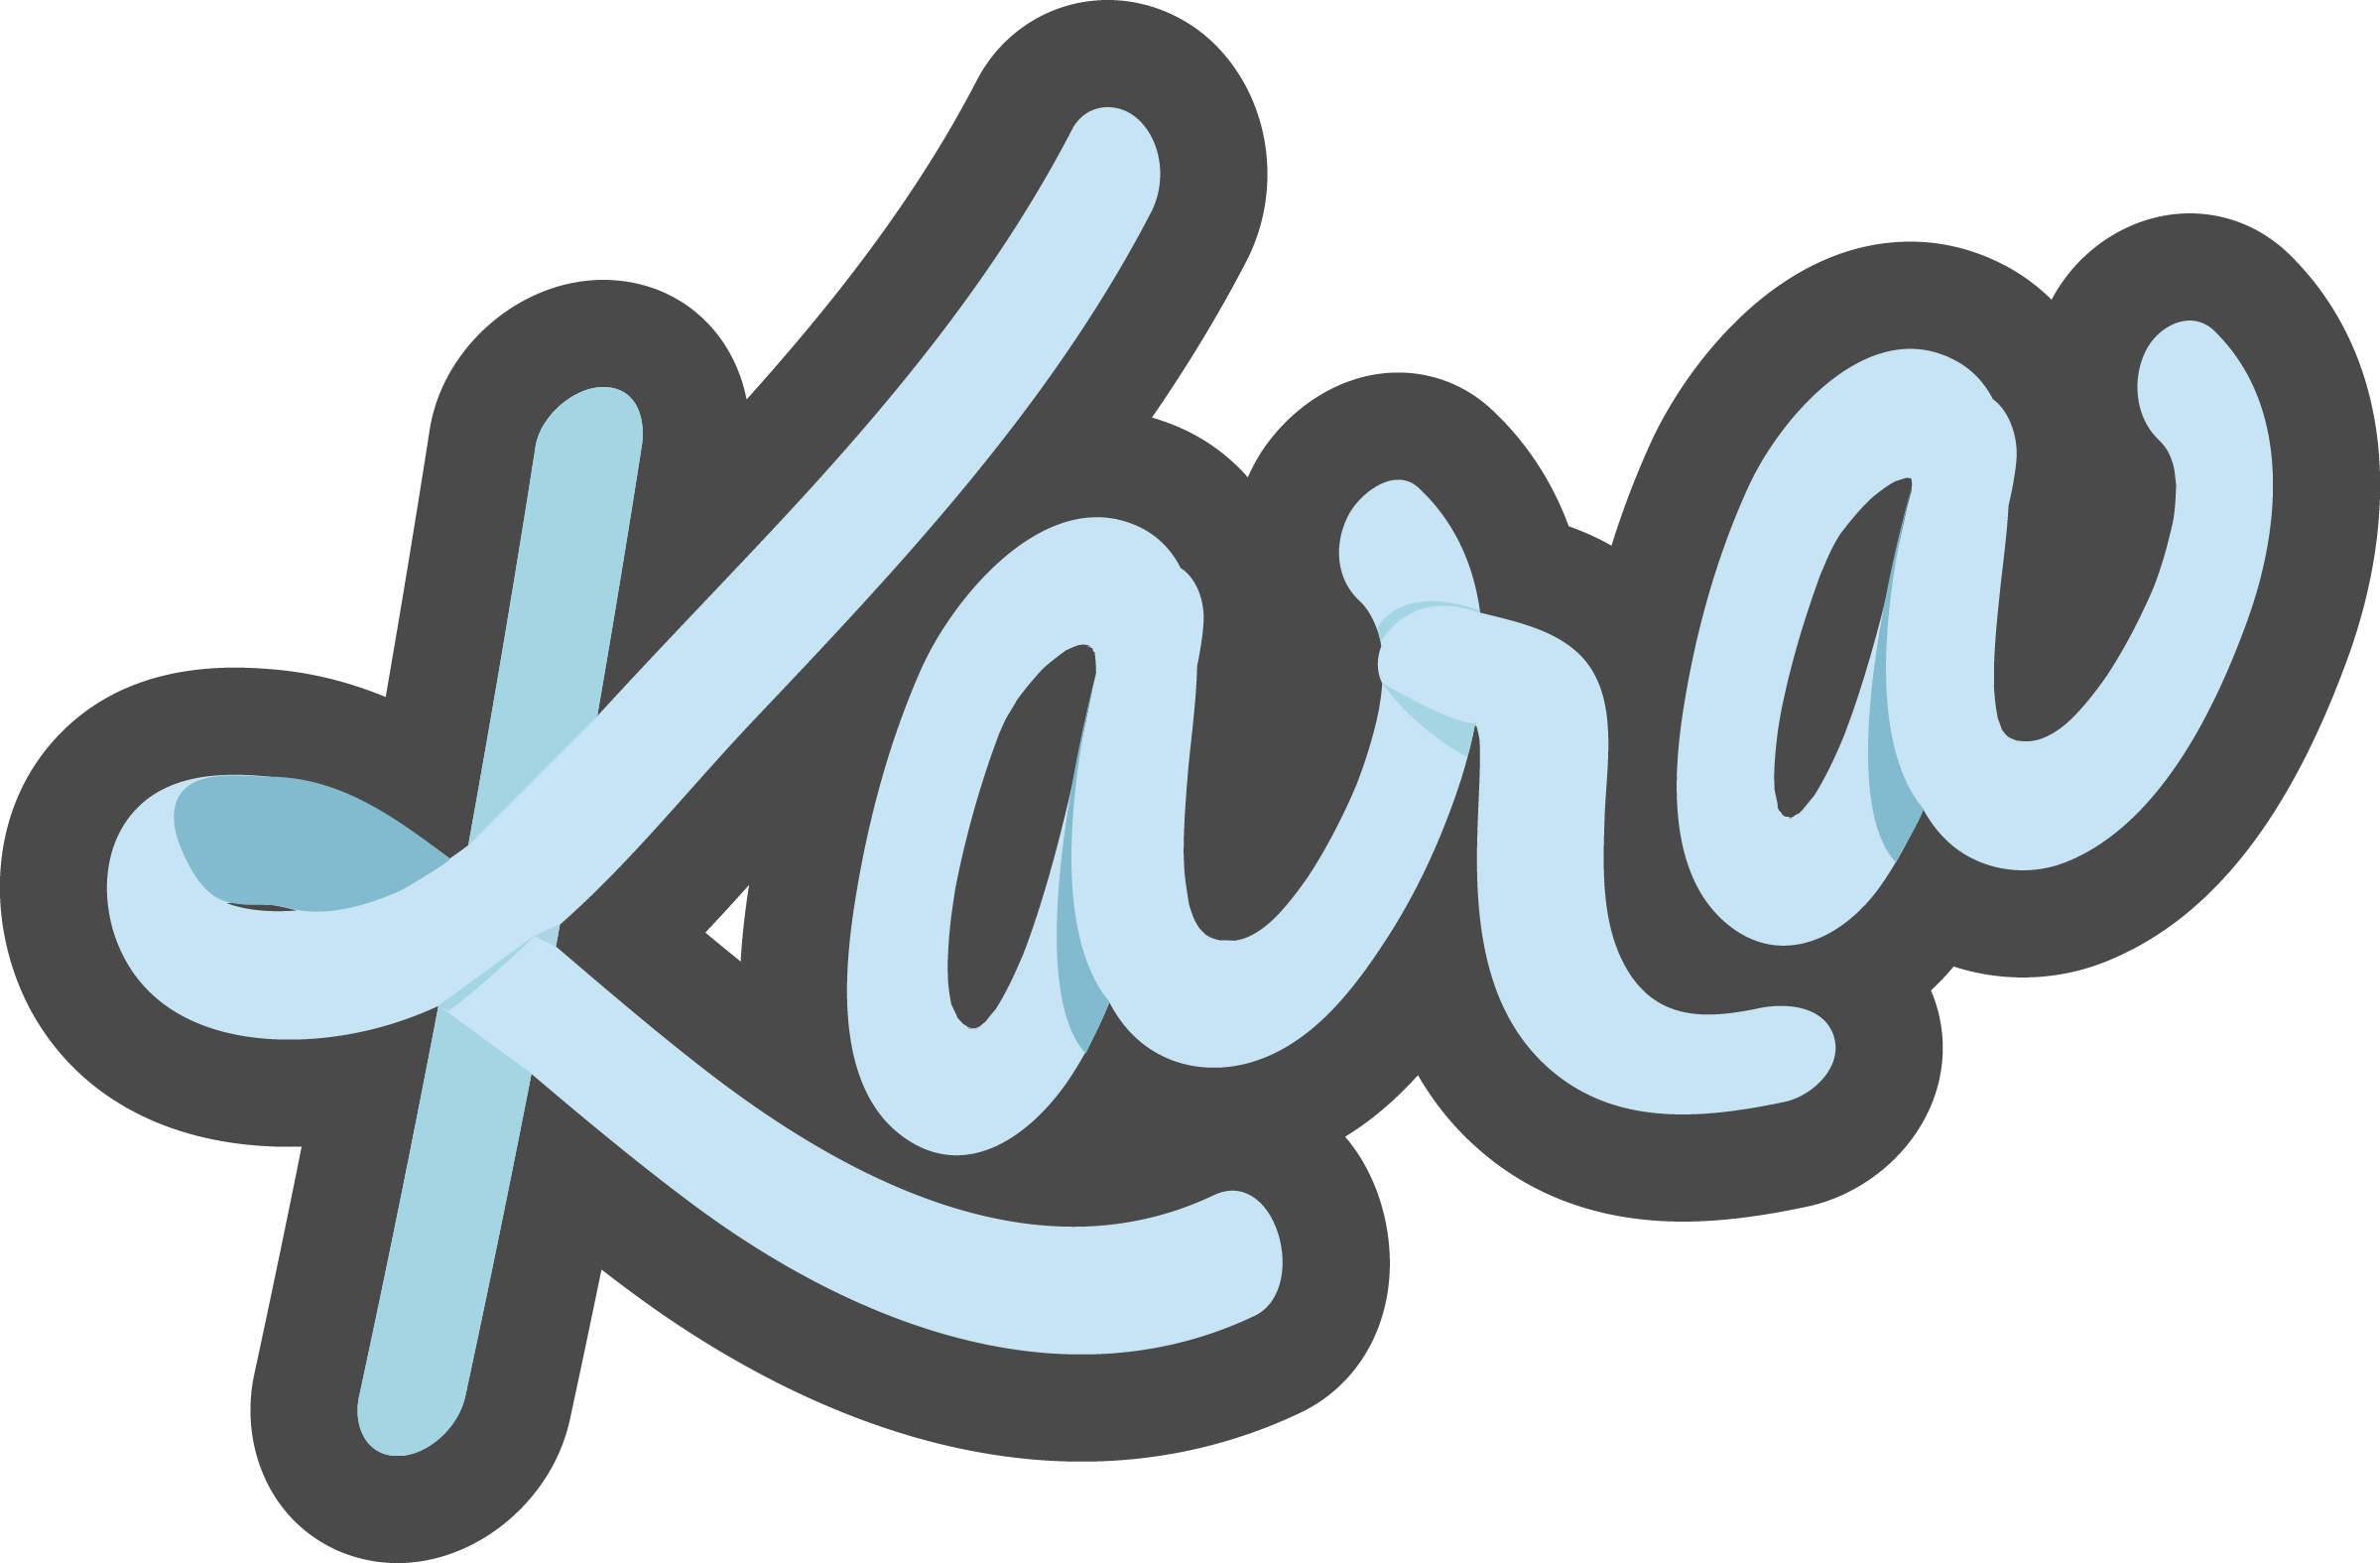 Kara Jurgensen